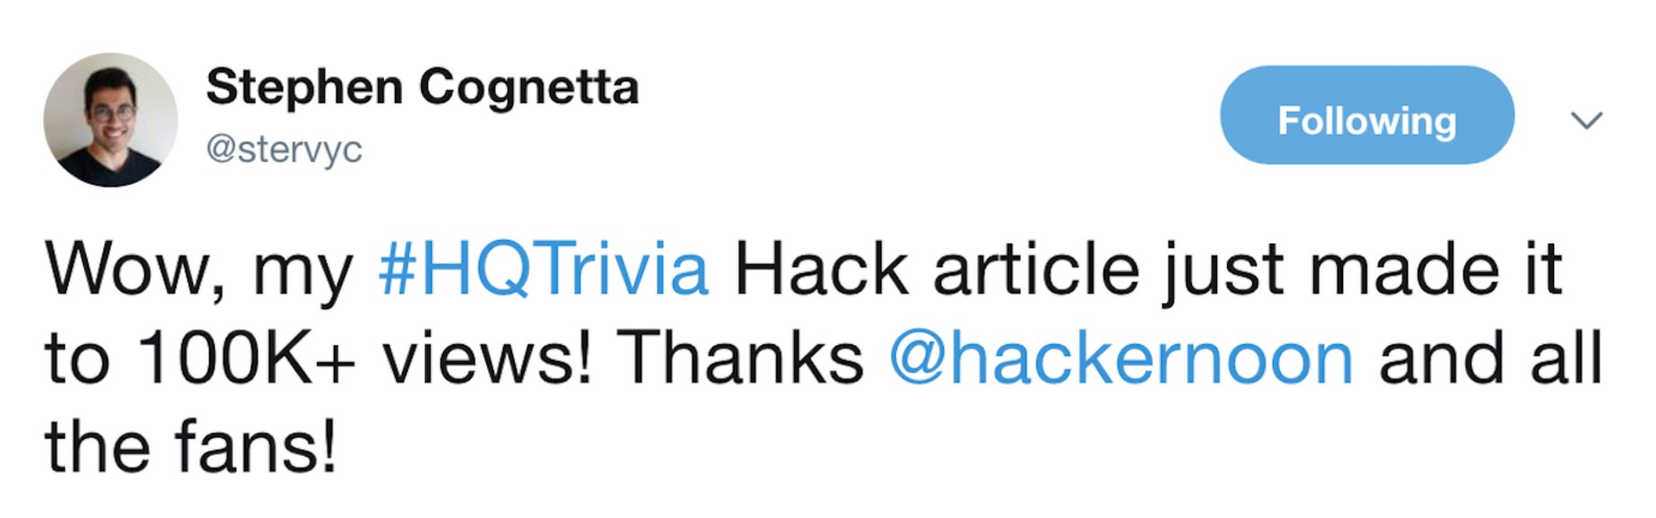 Stephen Cognetta, Hack Mental Health Founder